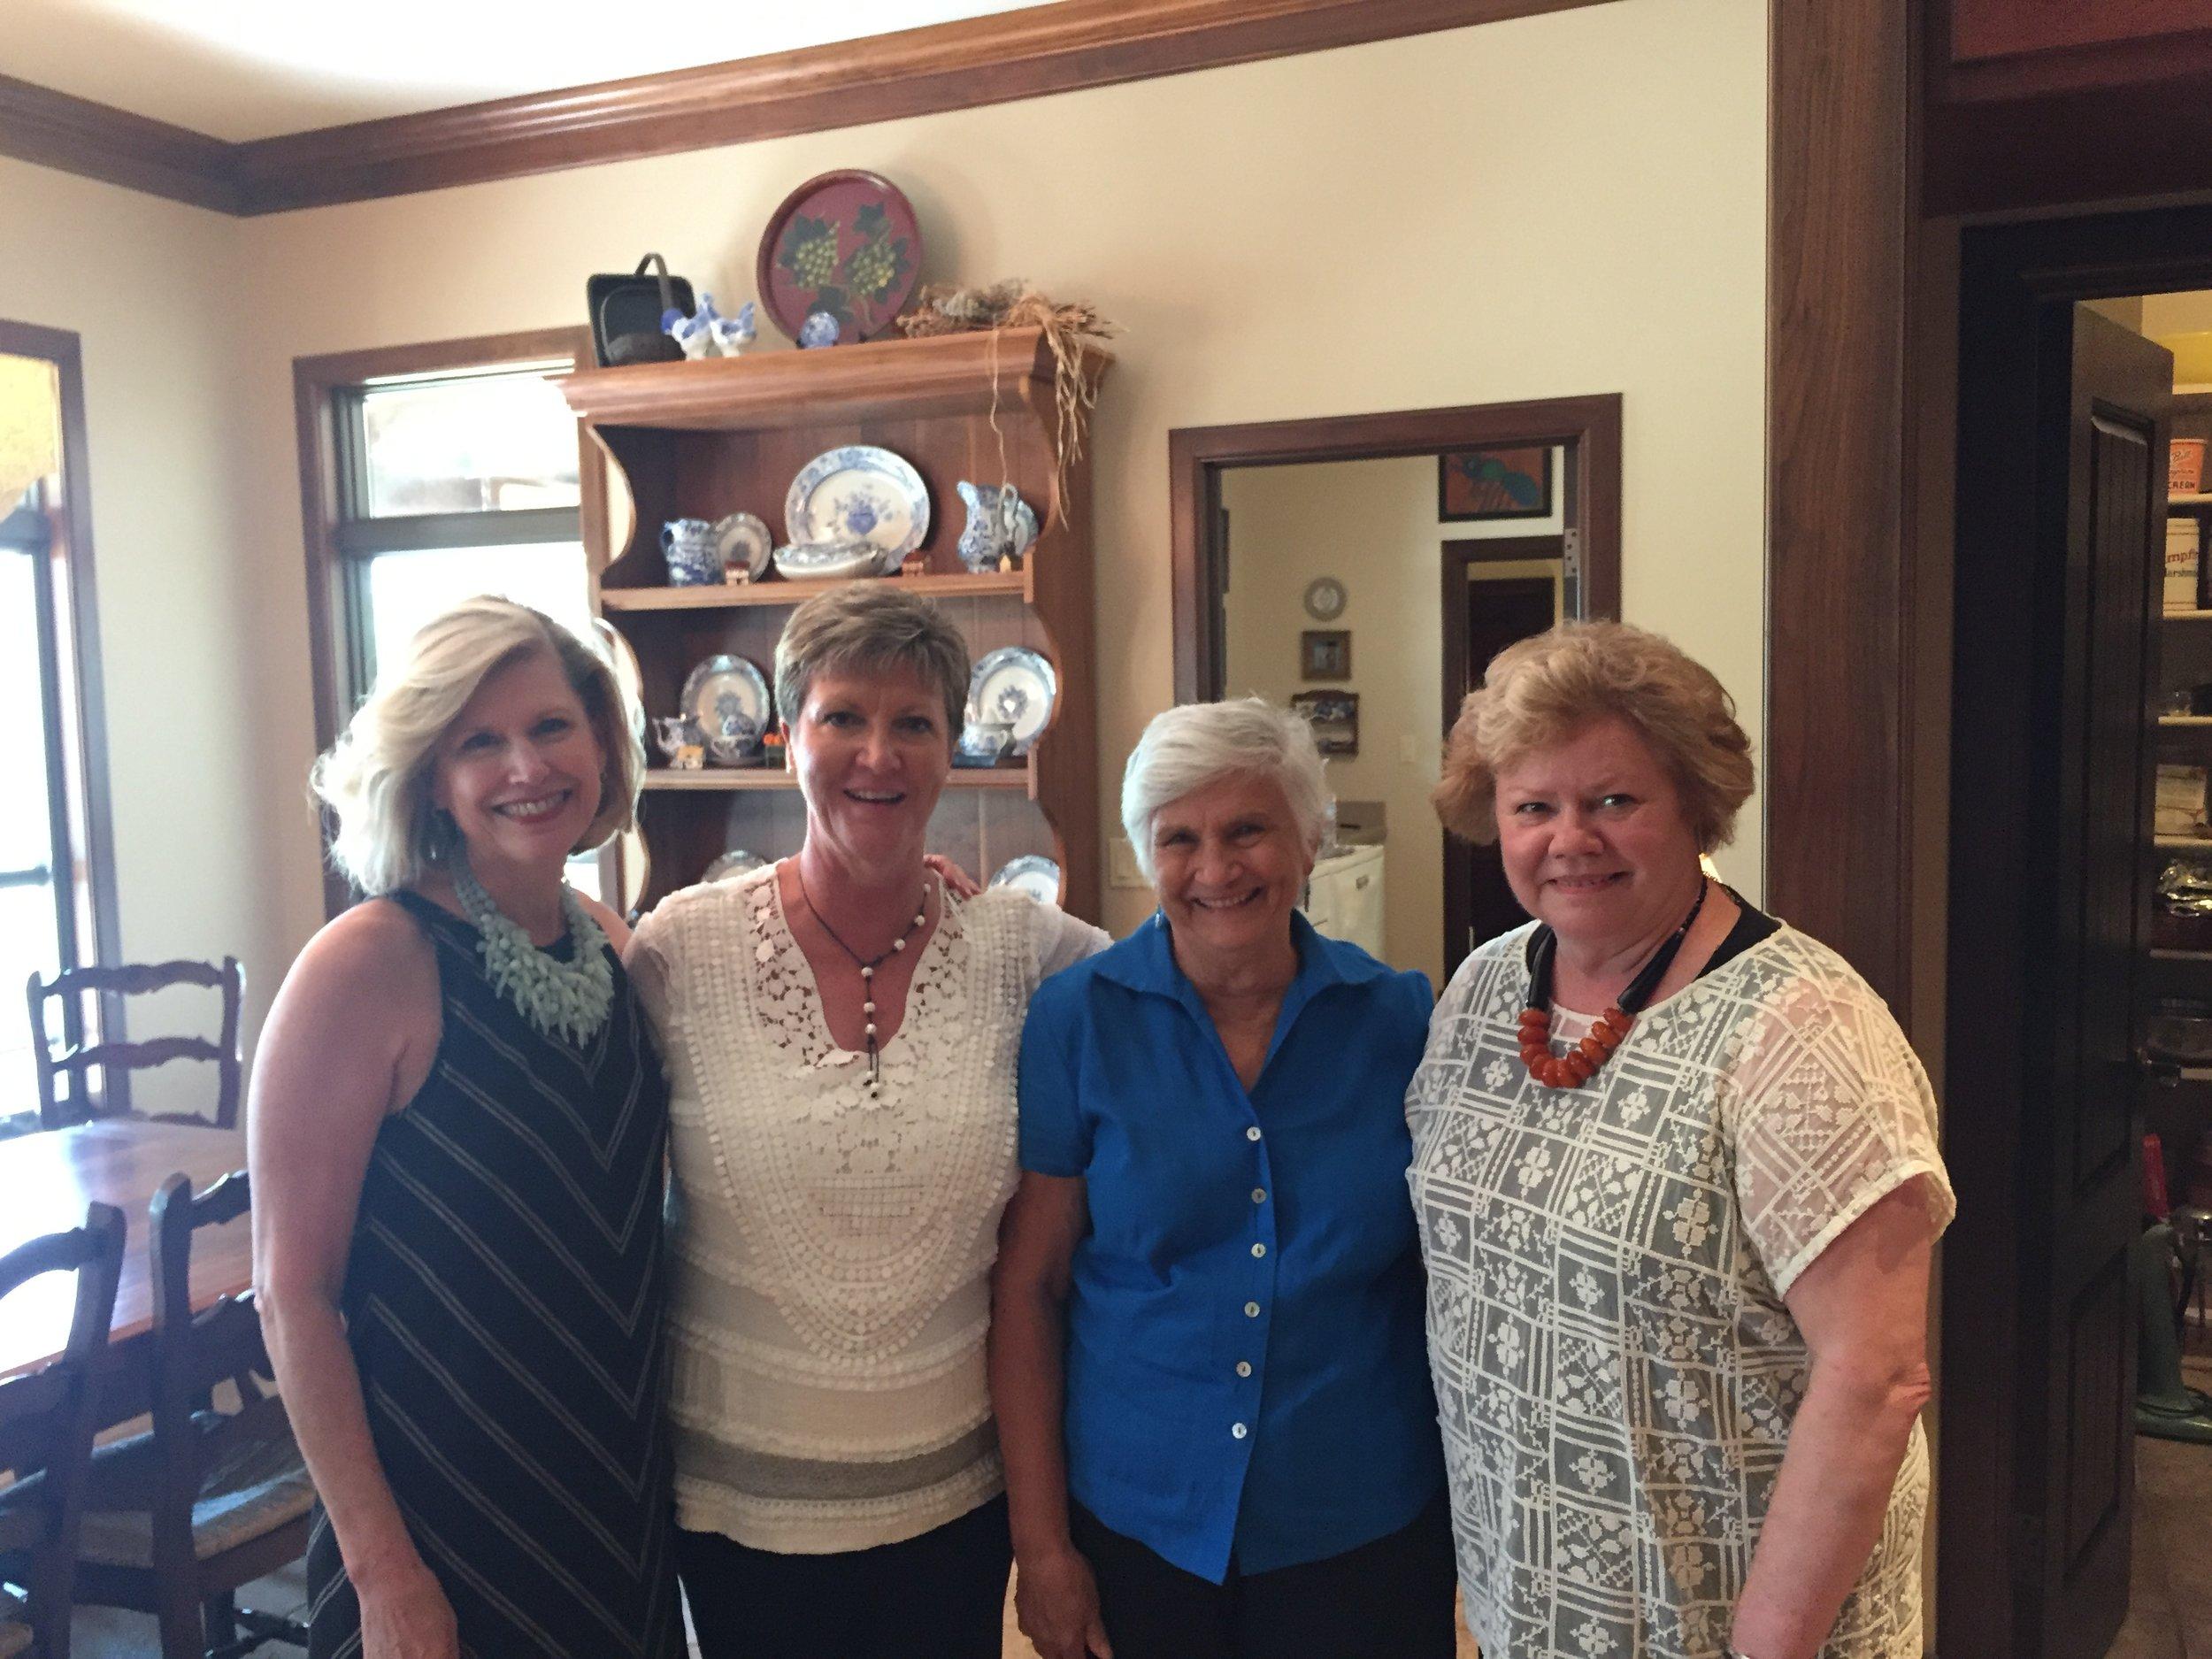 Co-Hostesses - Debbie Urquhart, Debbie Meschwitz, Carolyn Sander and Hostess, Judy Pendergrass.